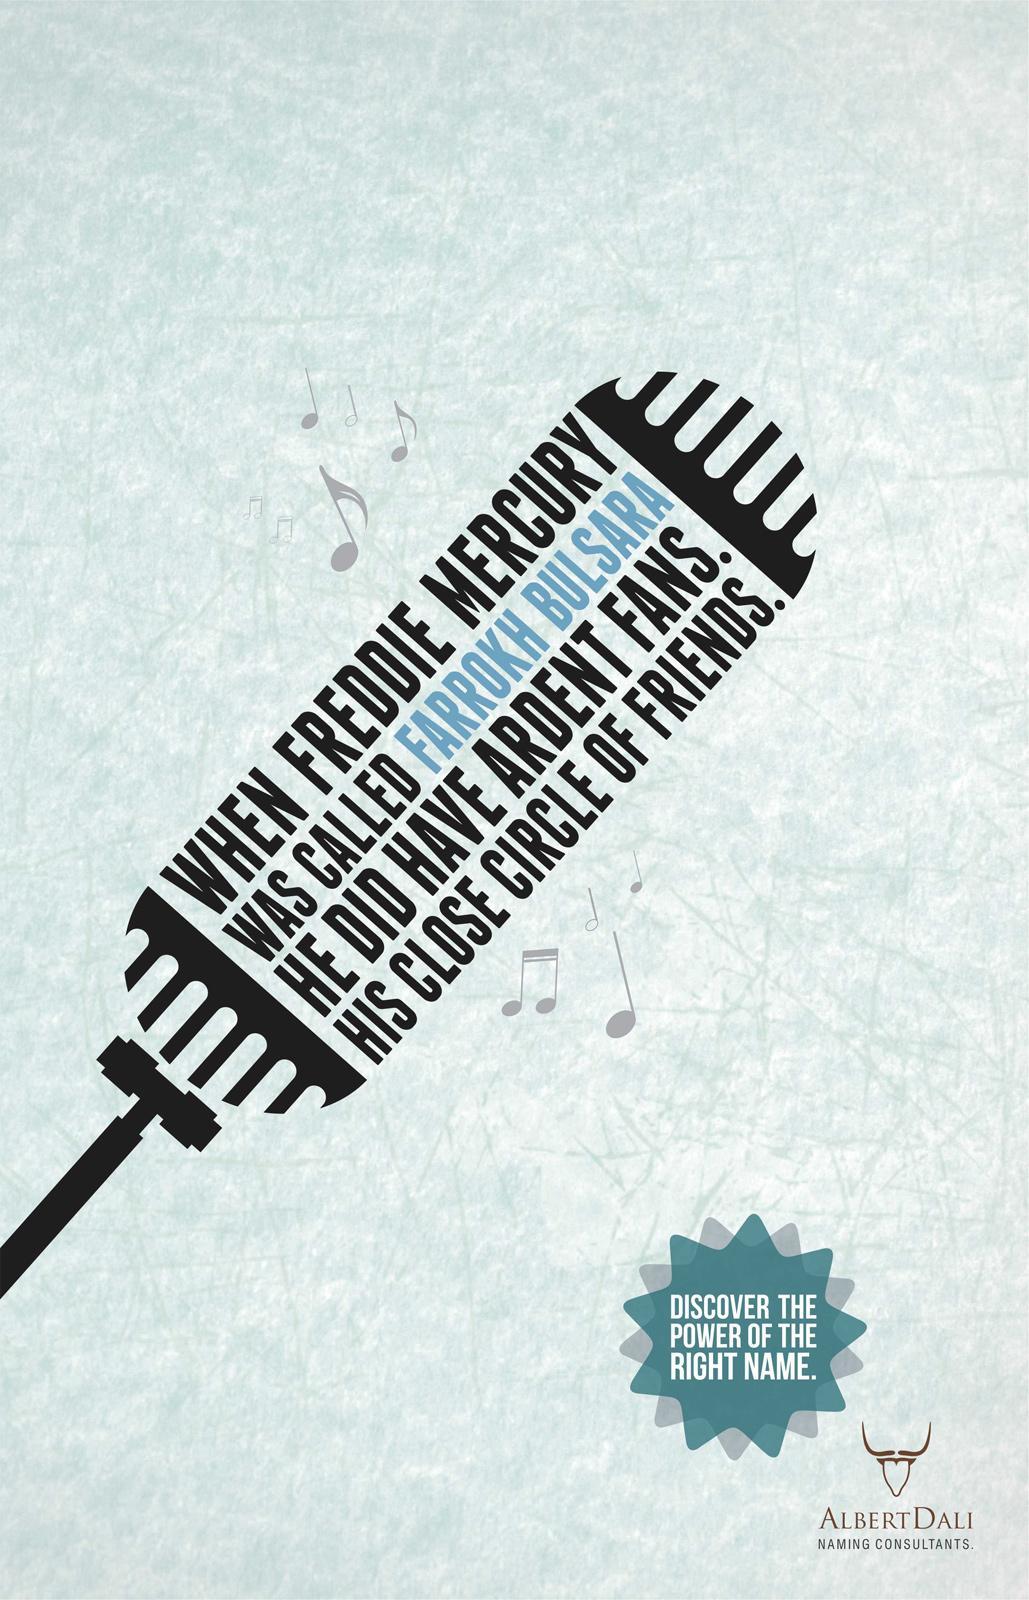 Albert Dali Print Ad -  Right Name, 1